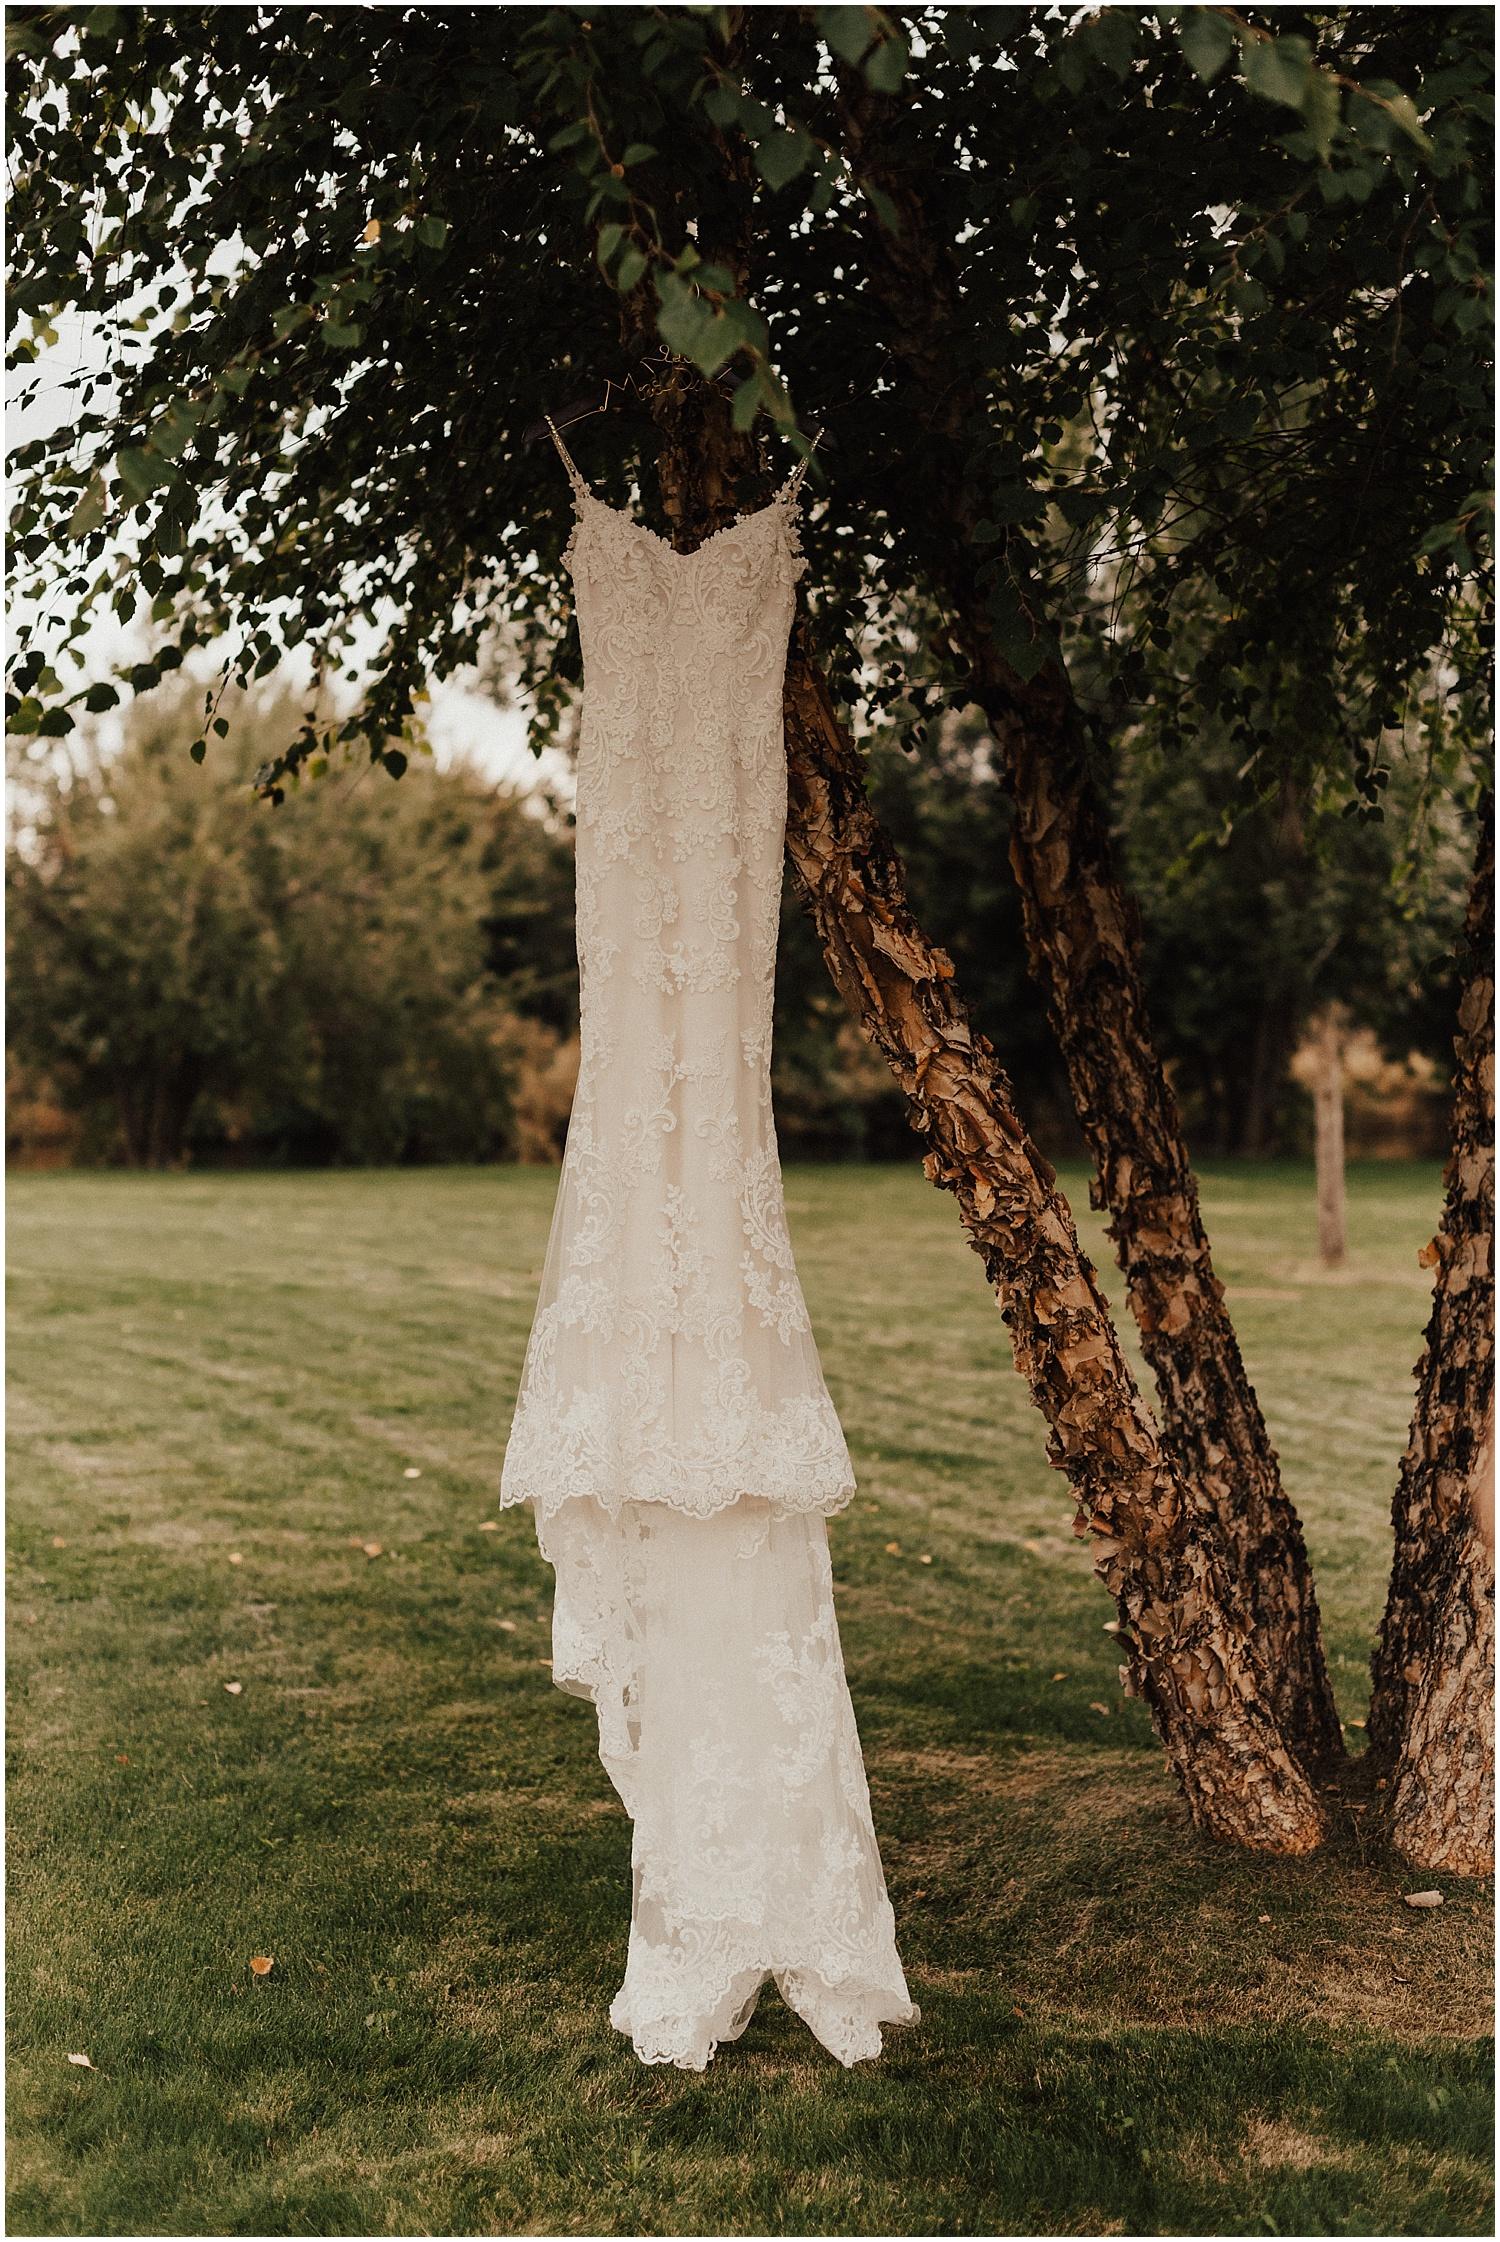 whimsical-summer-wedding-boise-idaho-las-vegas-bride5.jpg